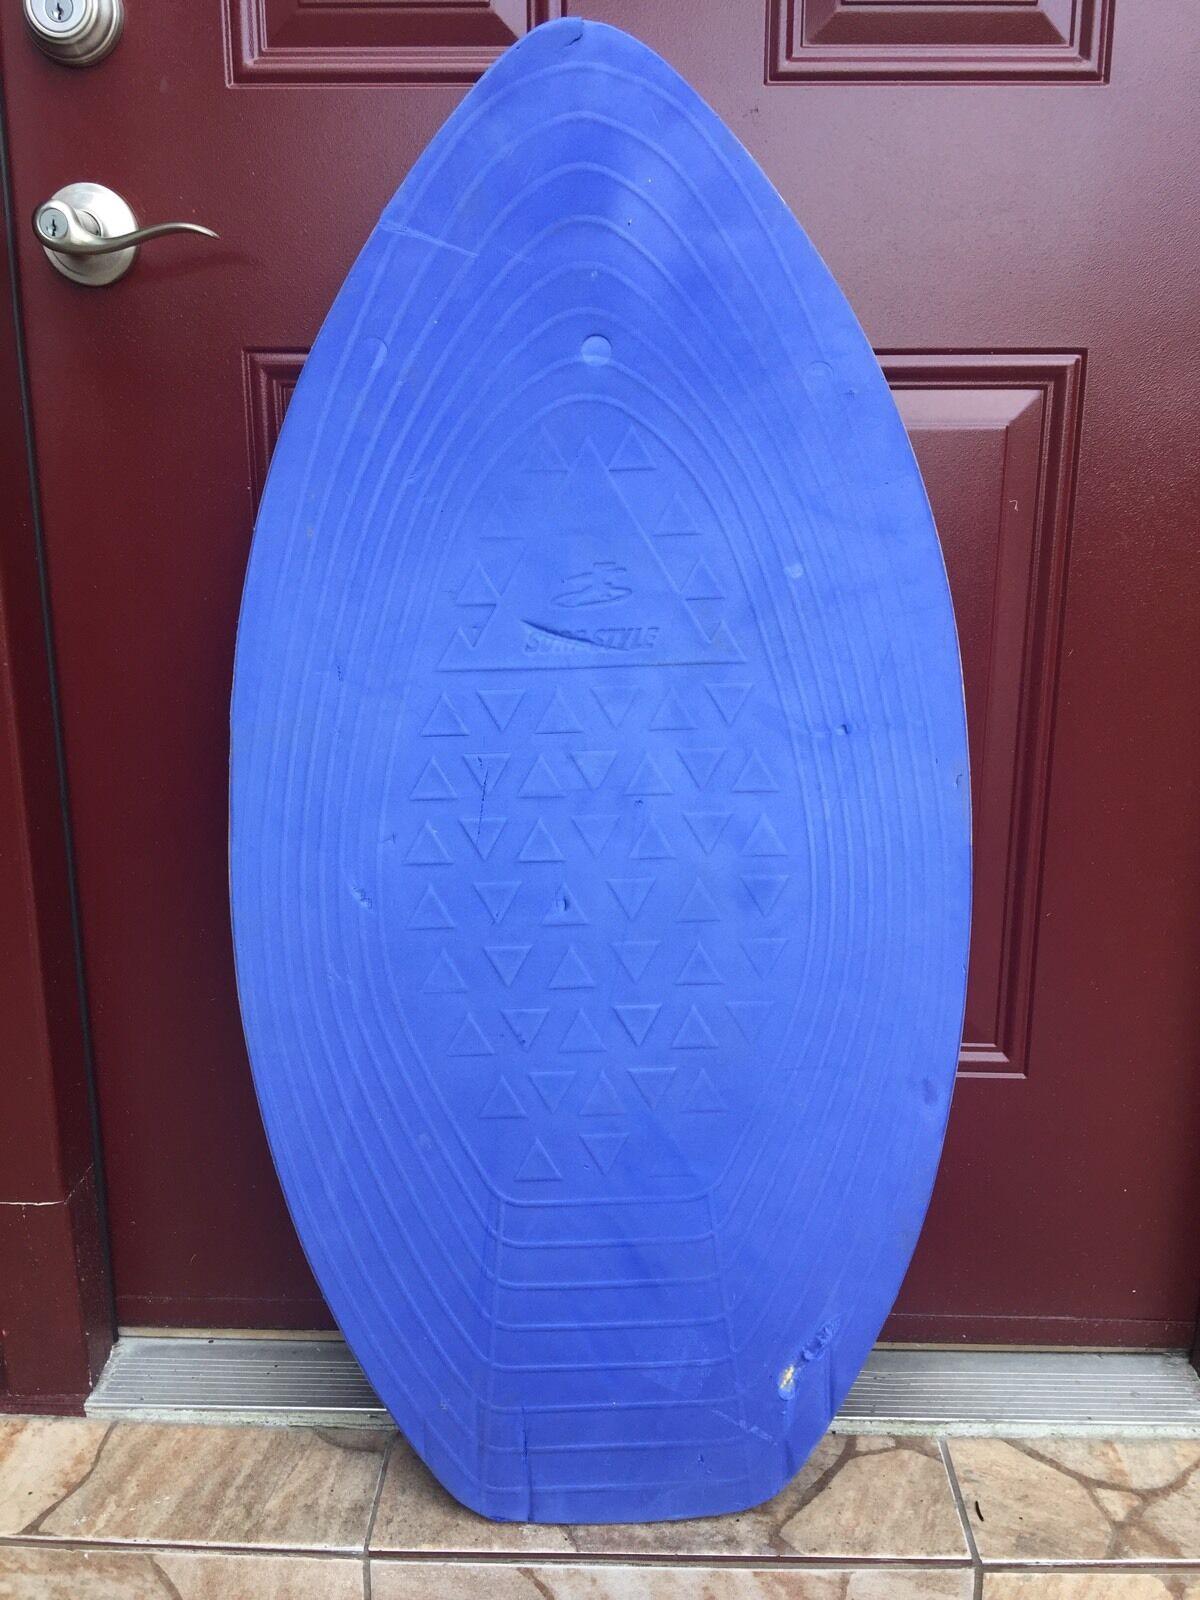 Surf Style Wooden Boogie Skim Board Surf Beach with bluee Foam 40 1 2  x 20 1 2